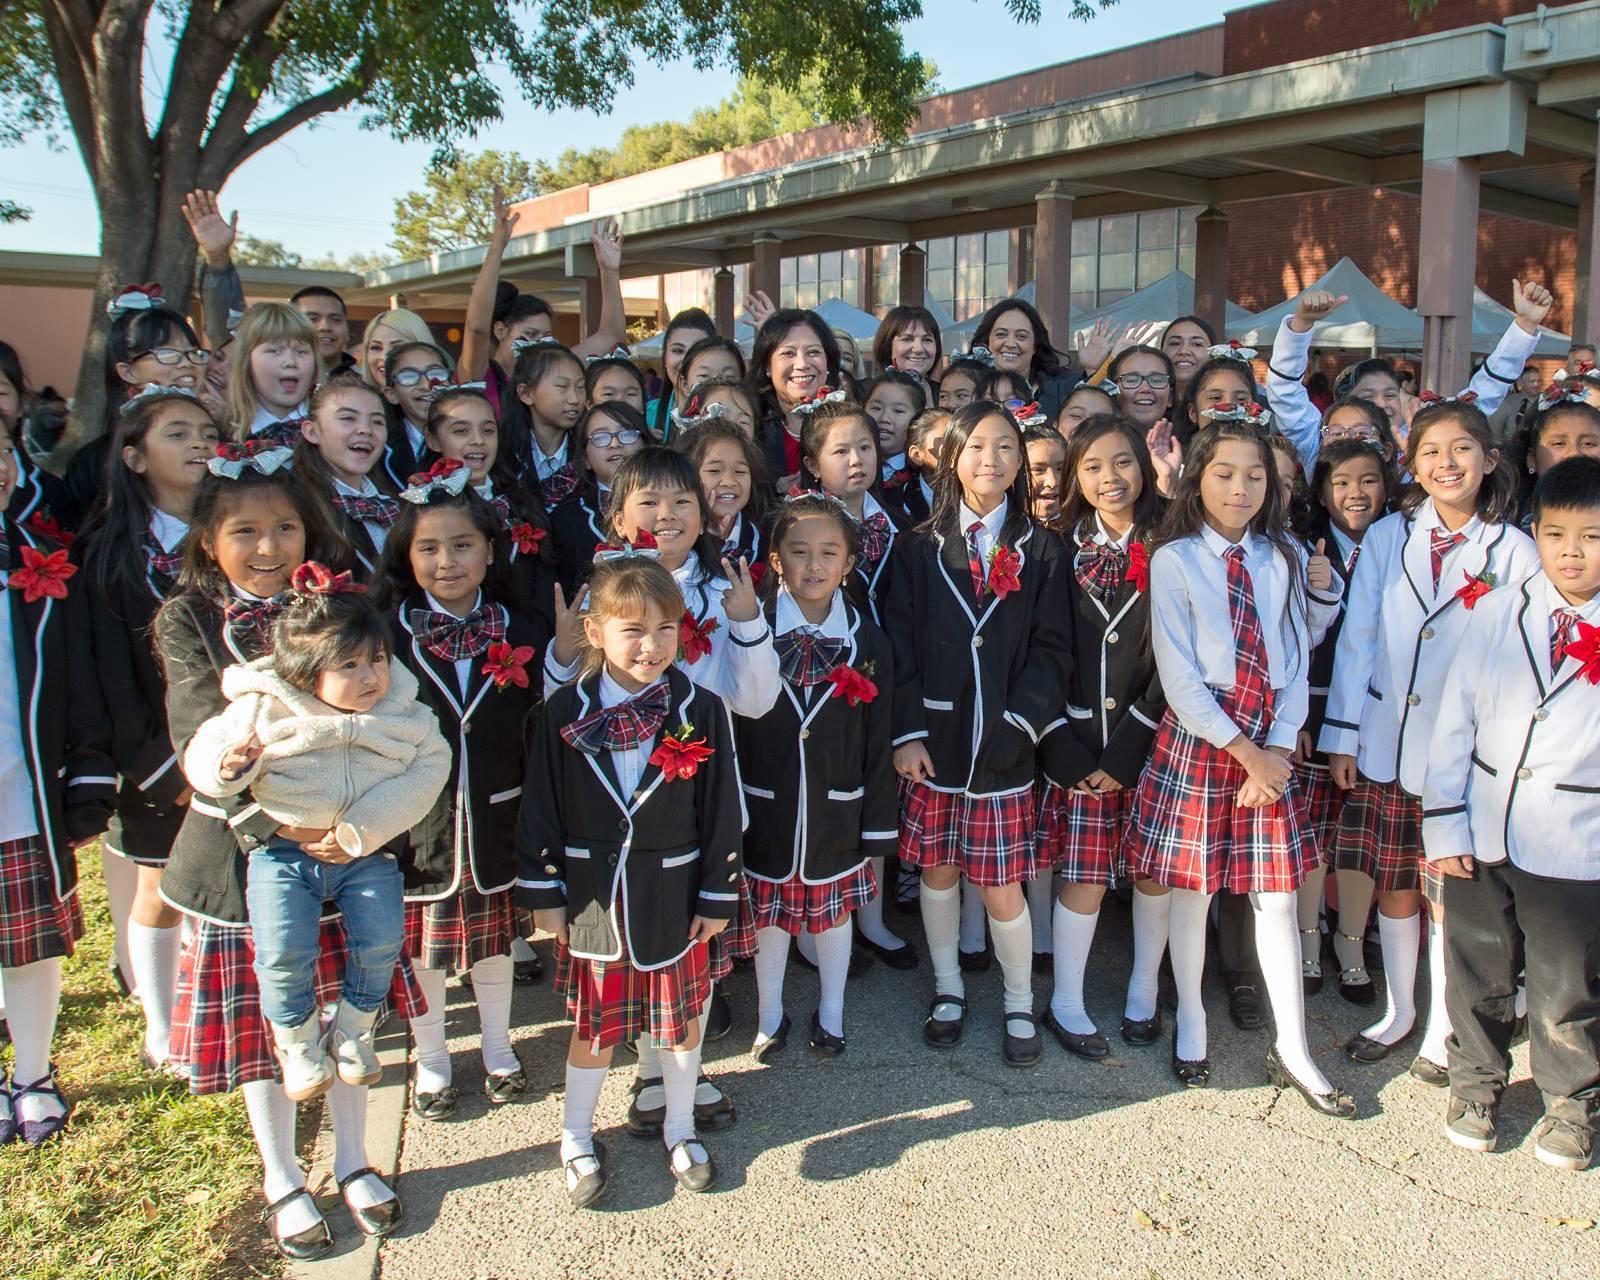 Garvey School District's Rhythmax student choir